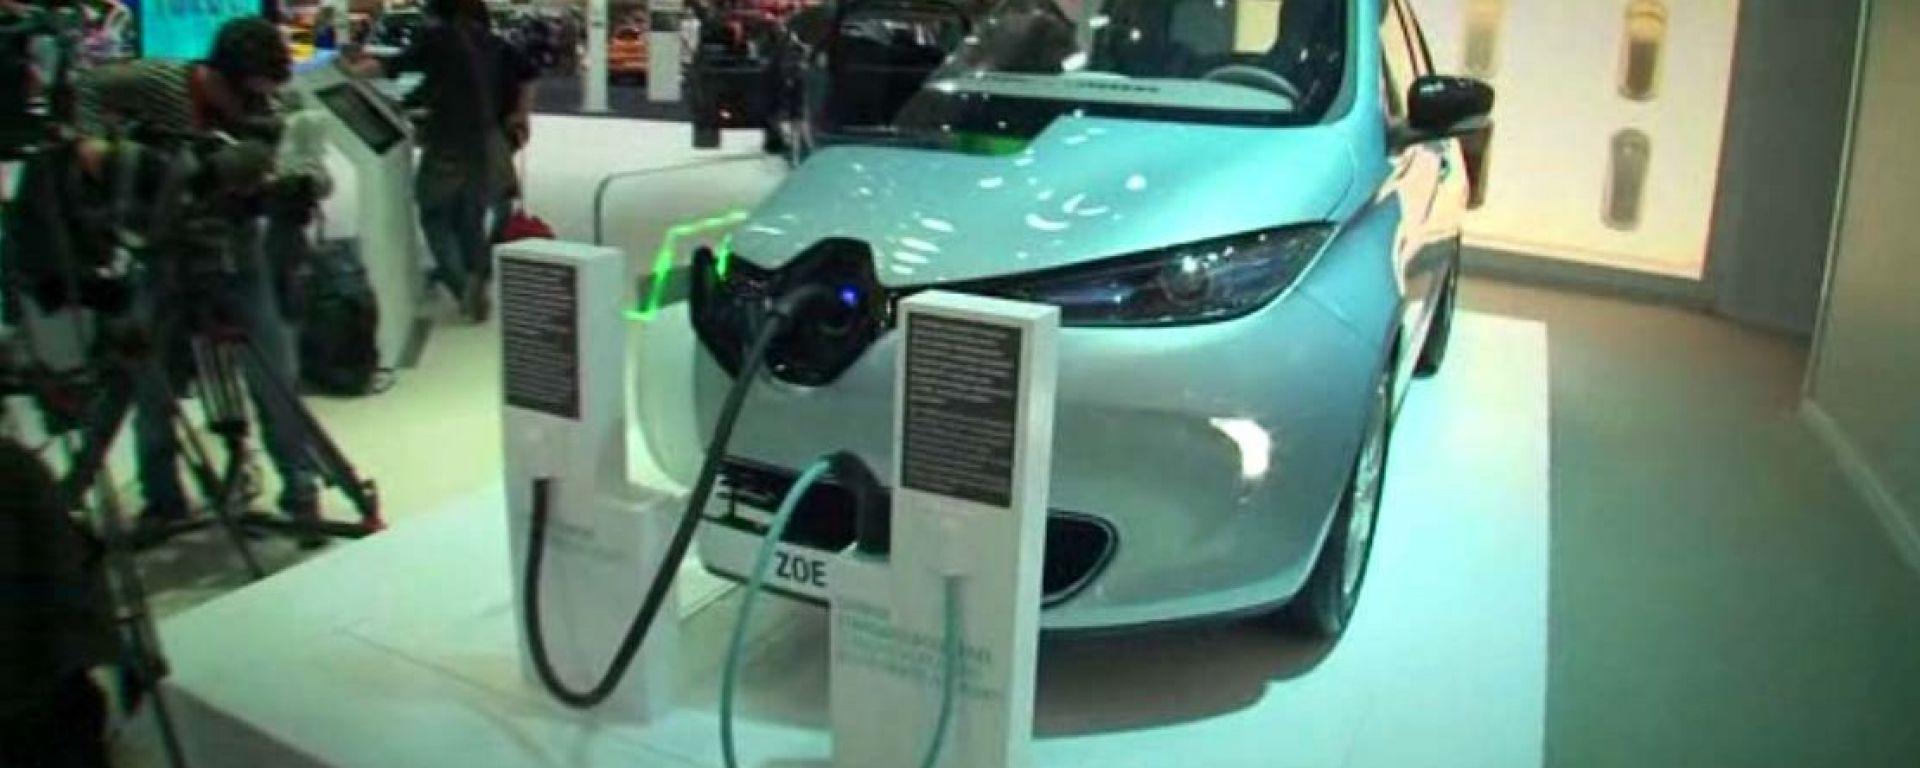 Salone di Ginevra 2012: Renault